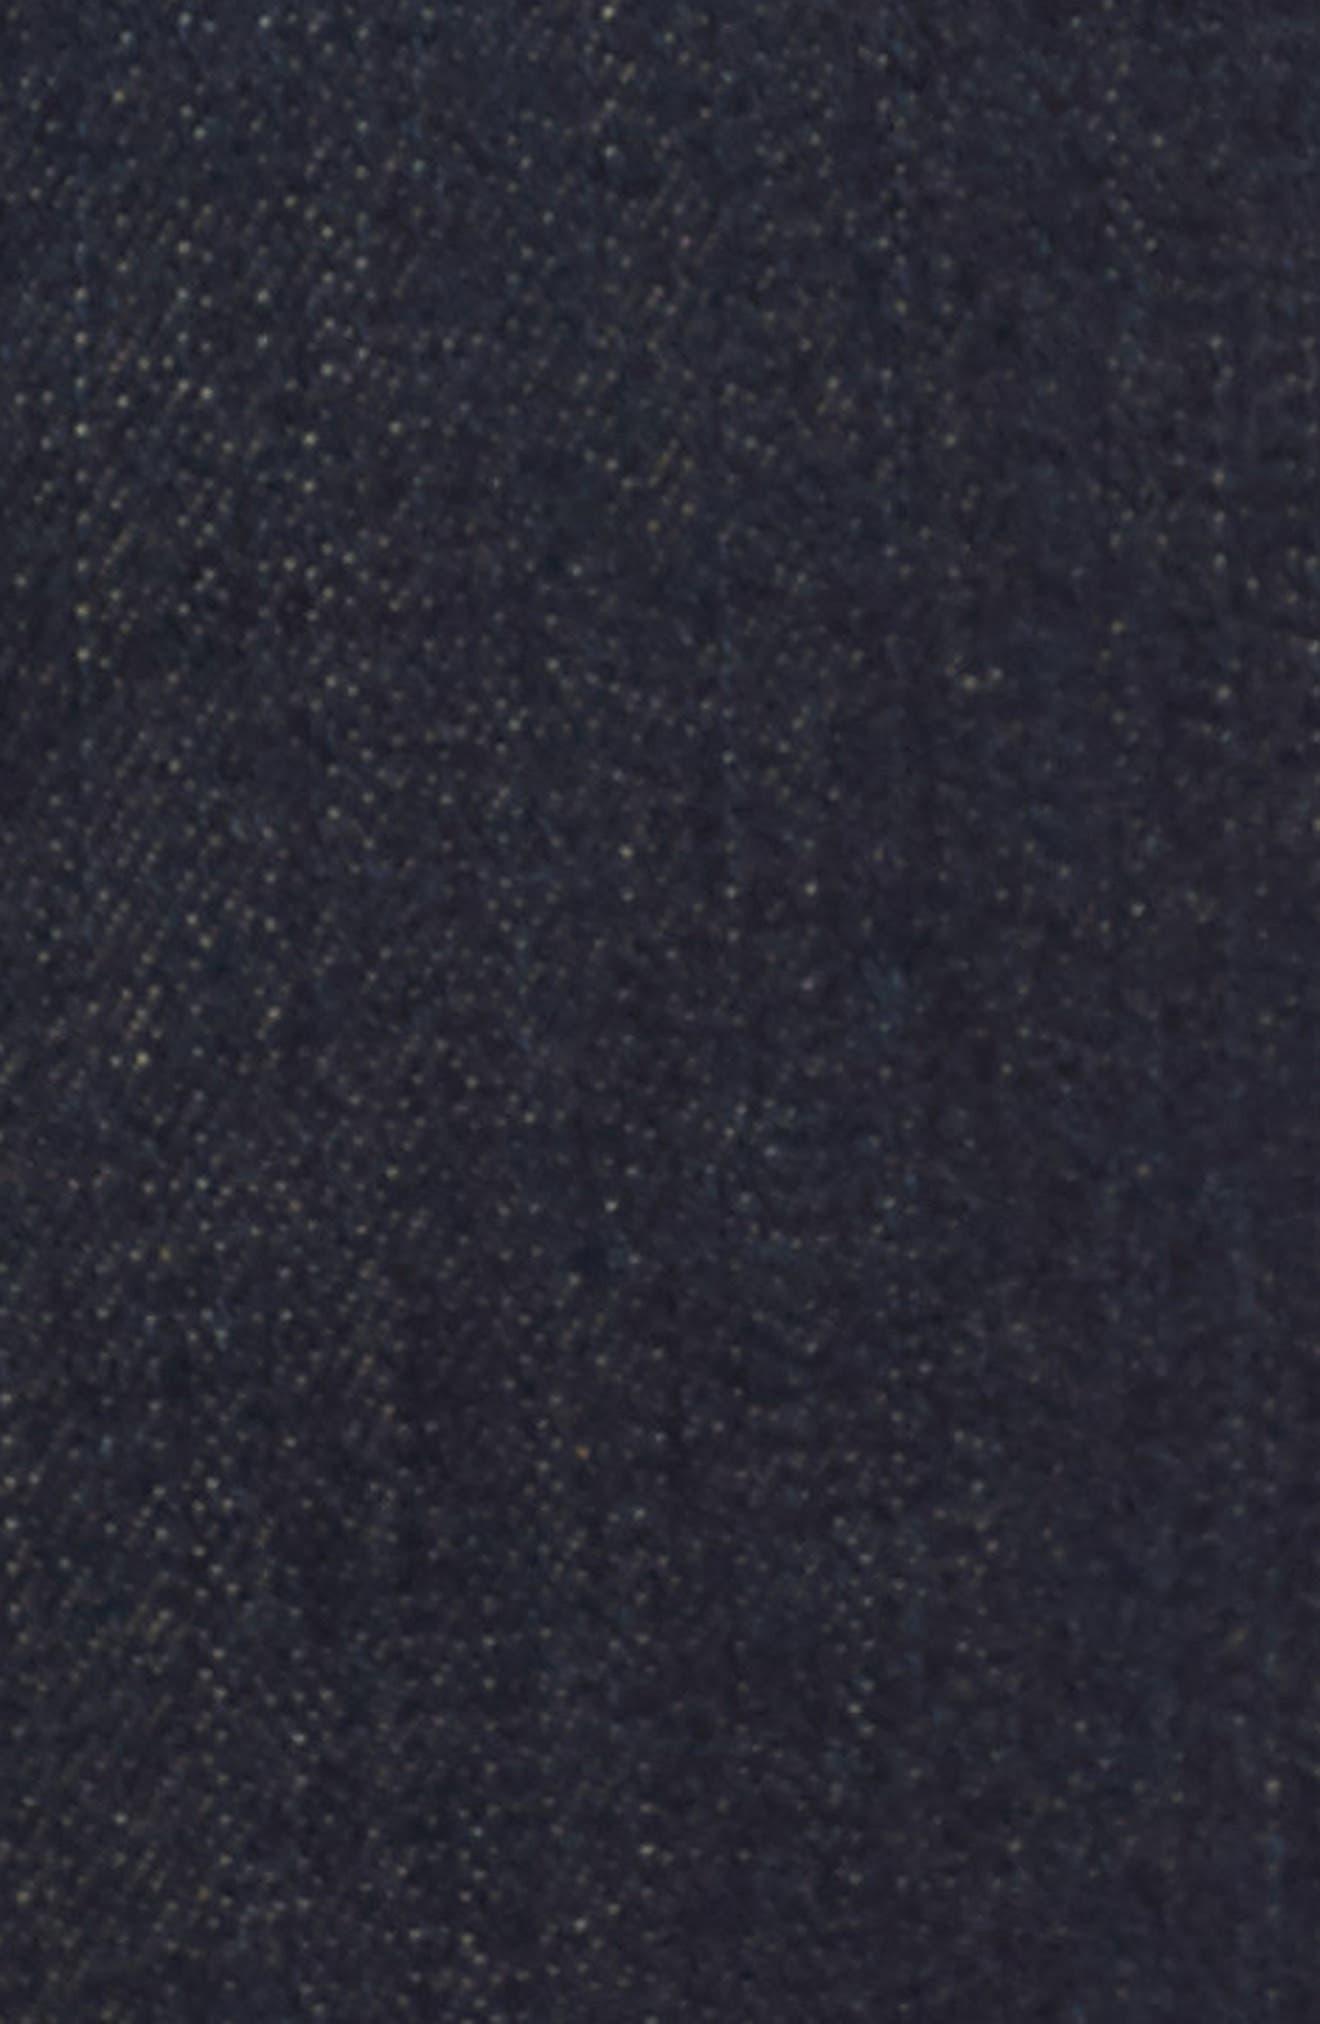 Diana Skinny Jeans,                             Alternate thumbnail 6, color,                             BLINDING W/ EURO BASE WASH